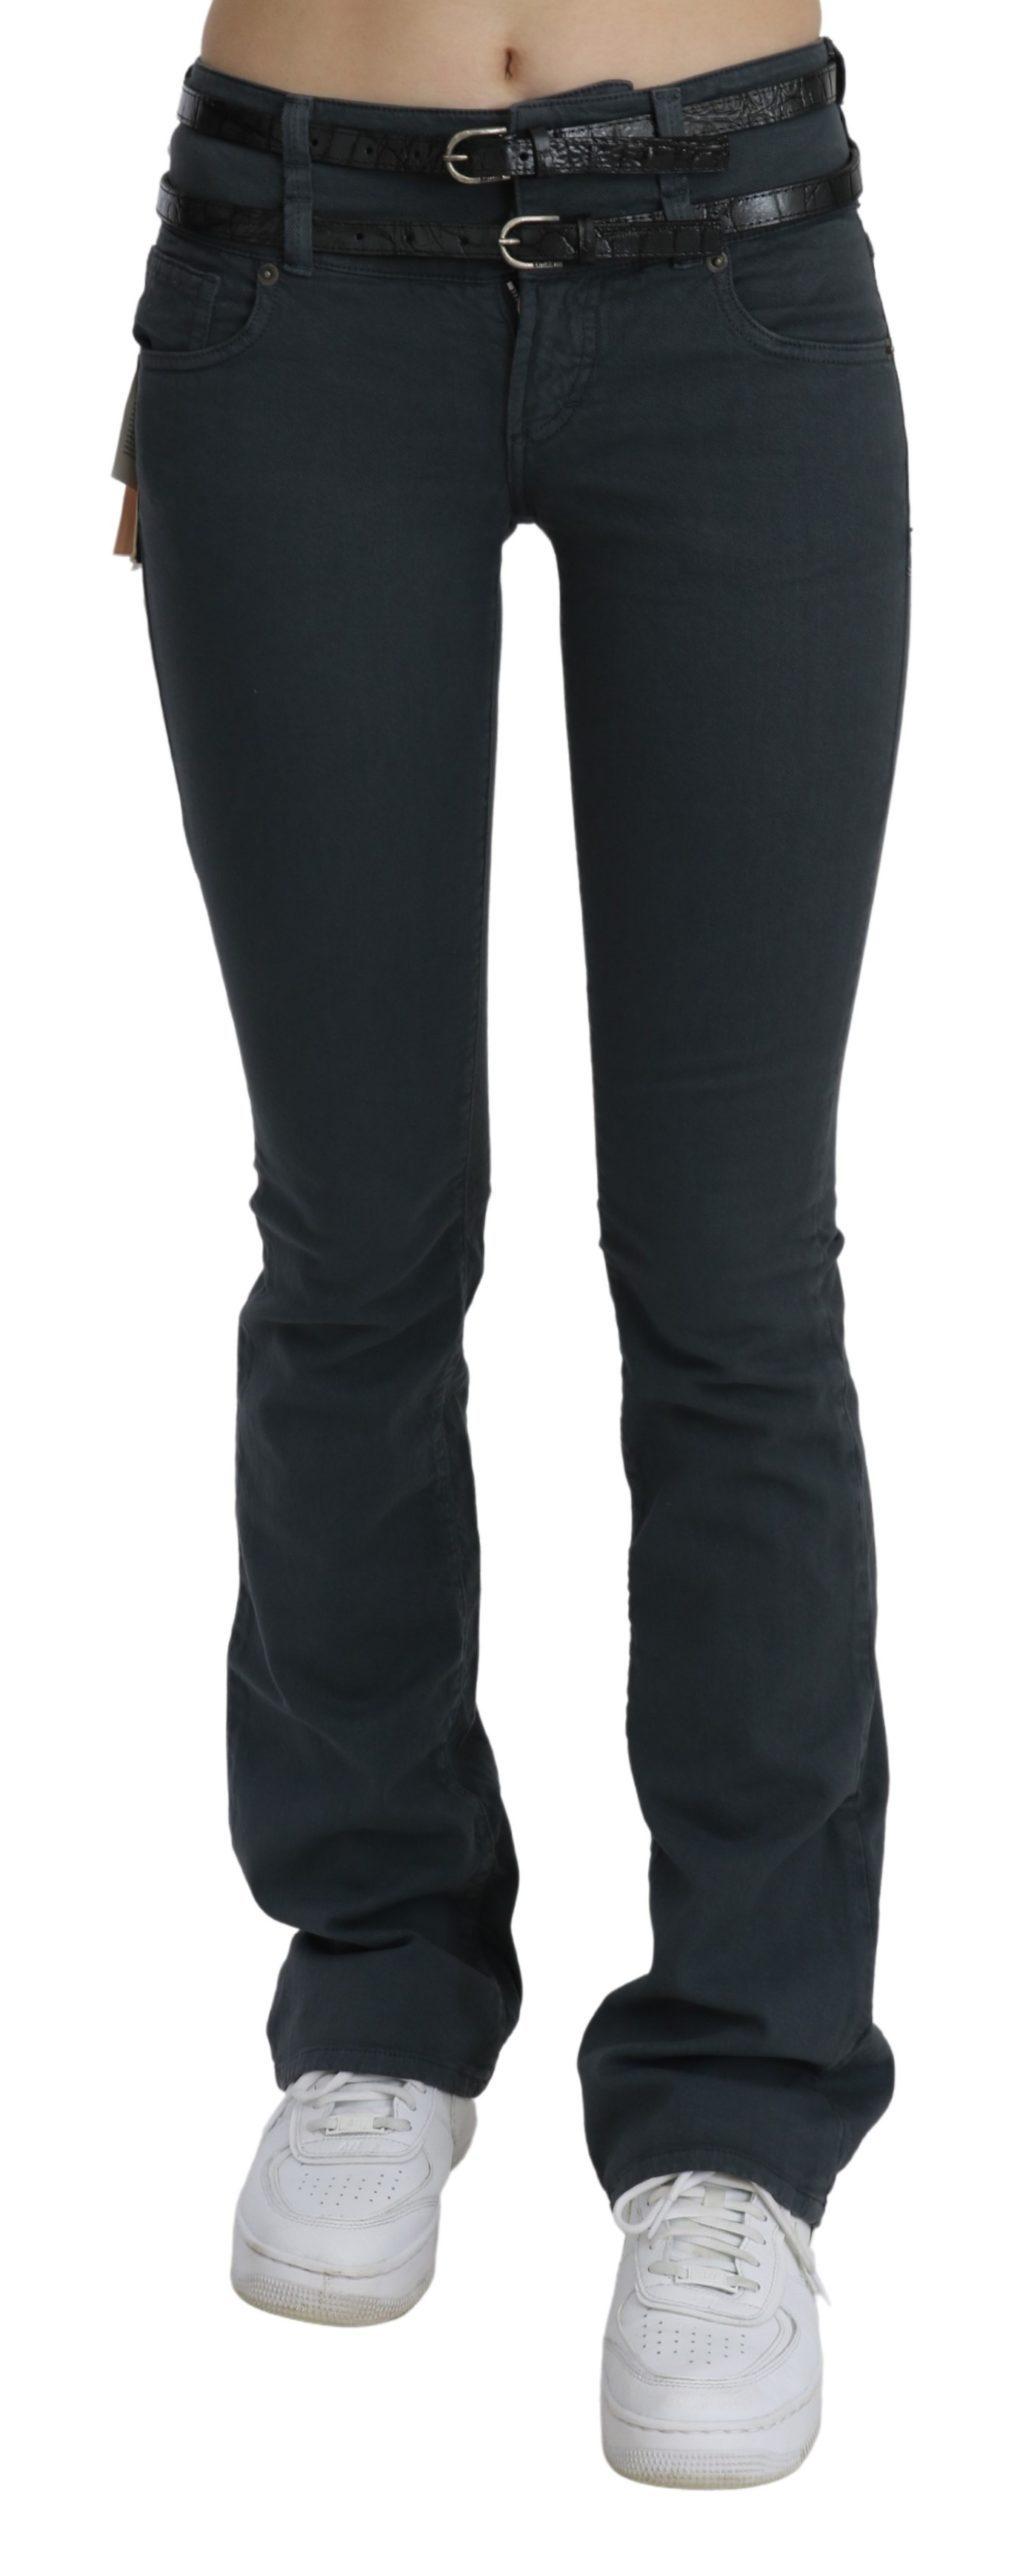 John Galliano Women's Mid Waist Slim Flared Denim Jeans Gray PAN70454 - W24